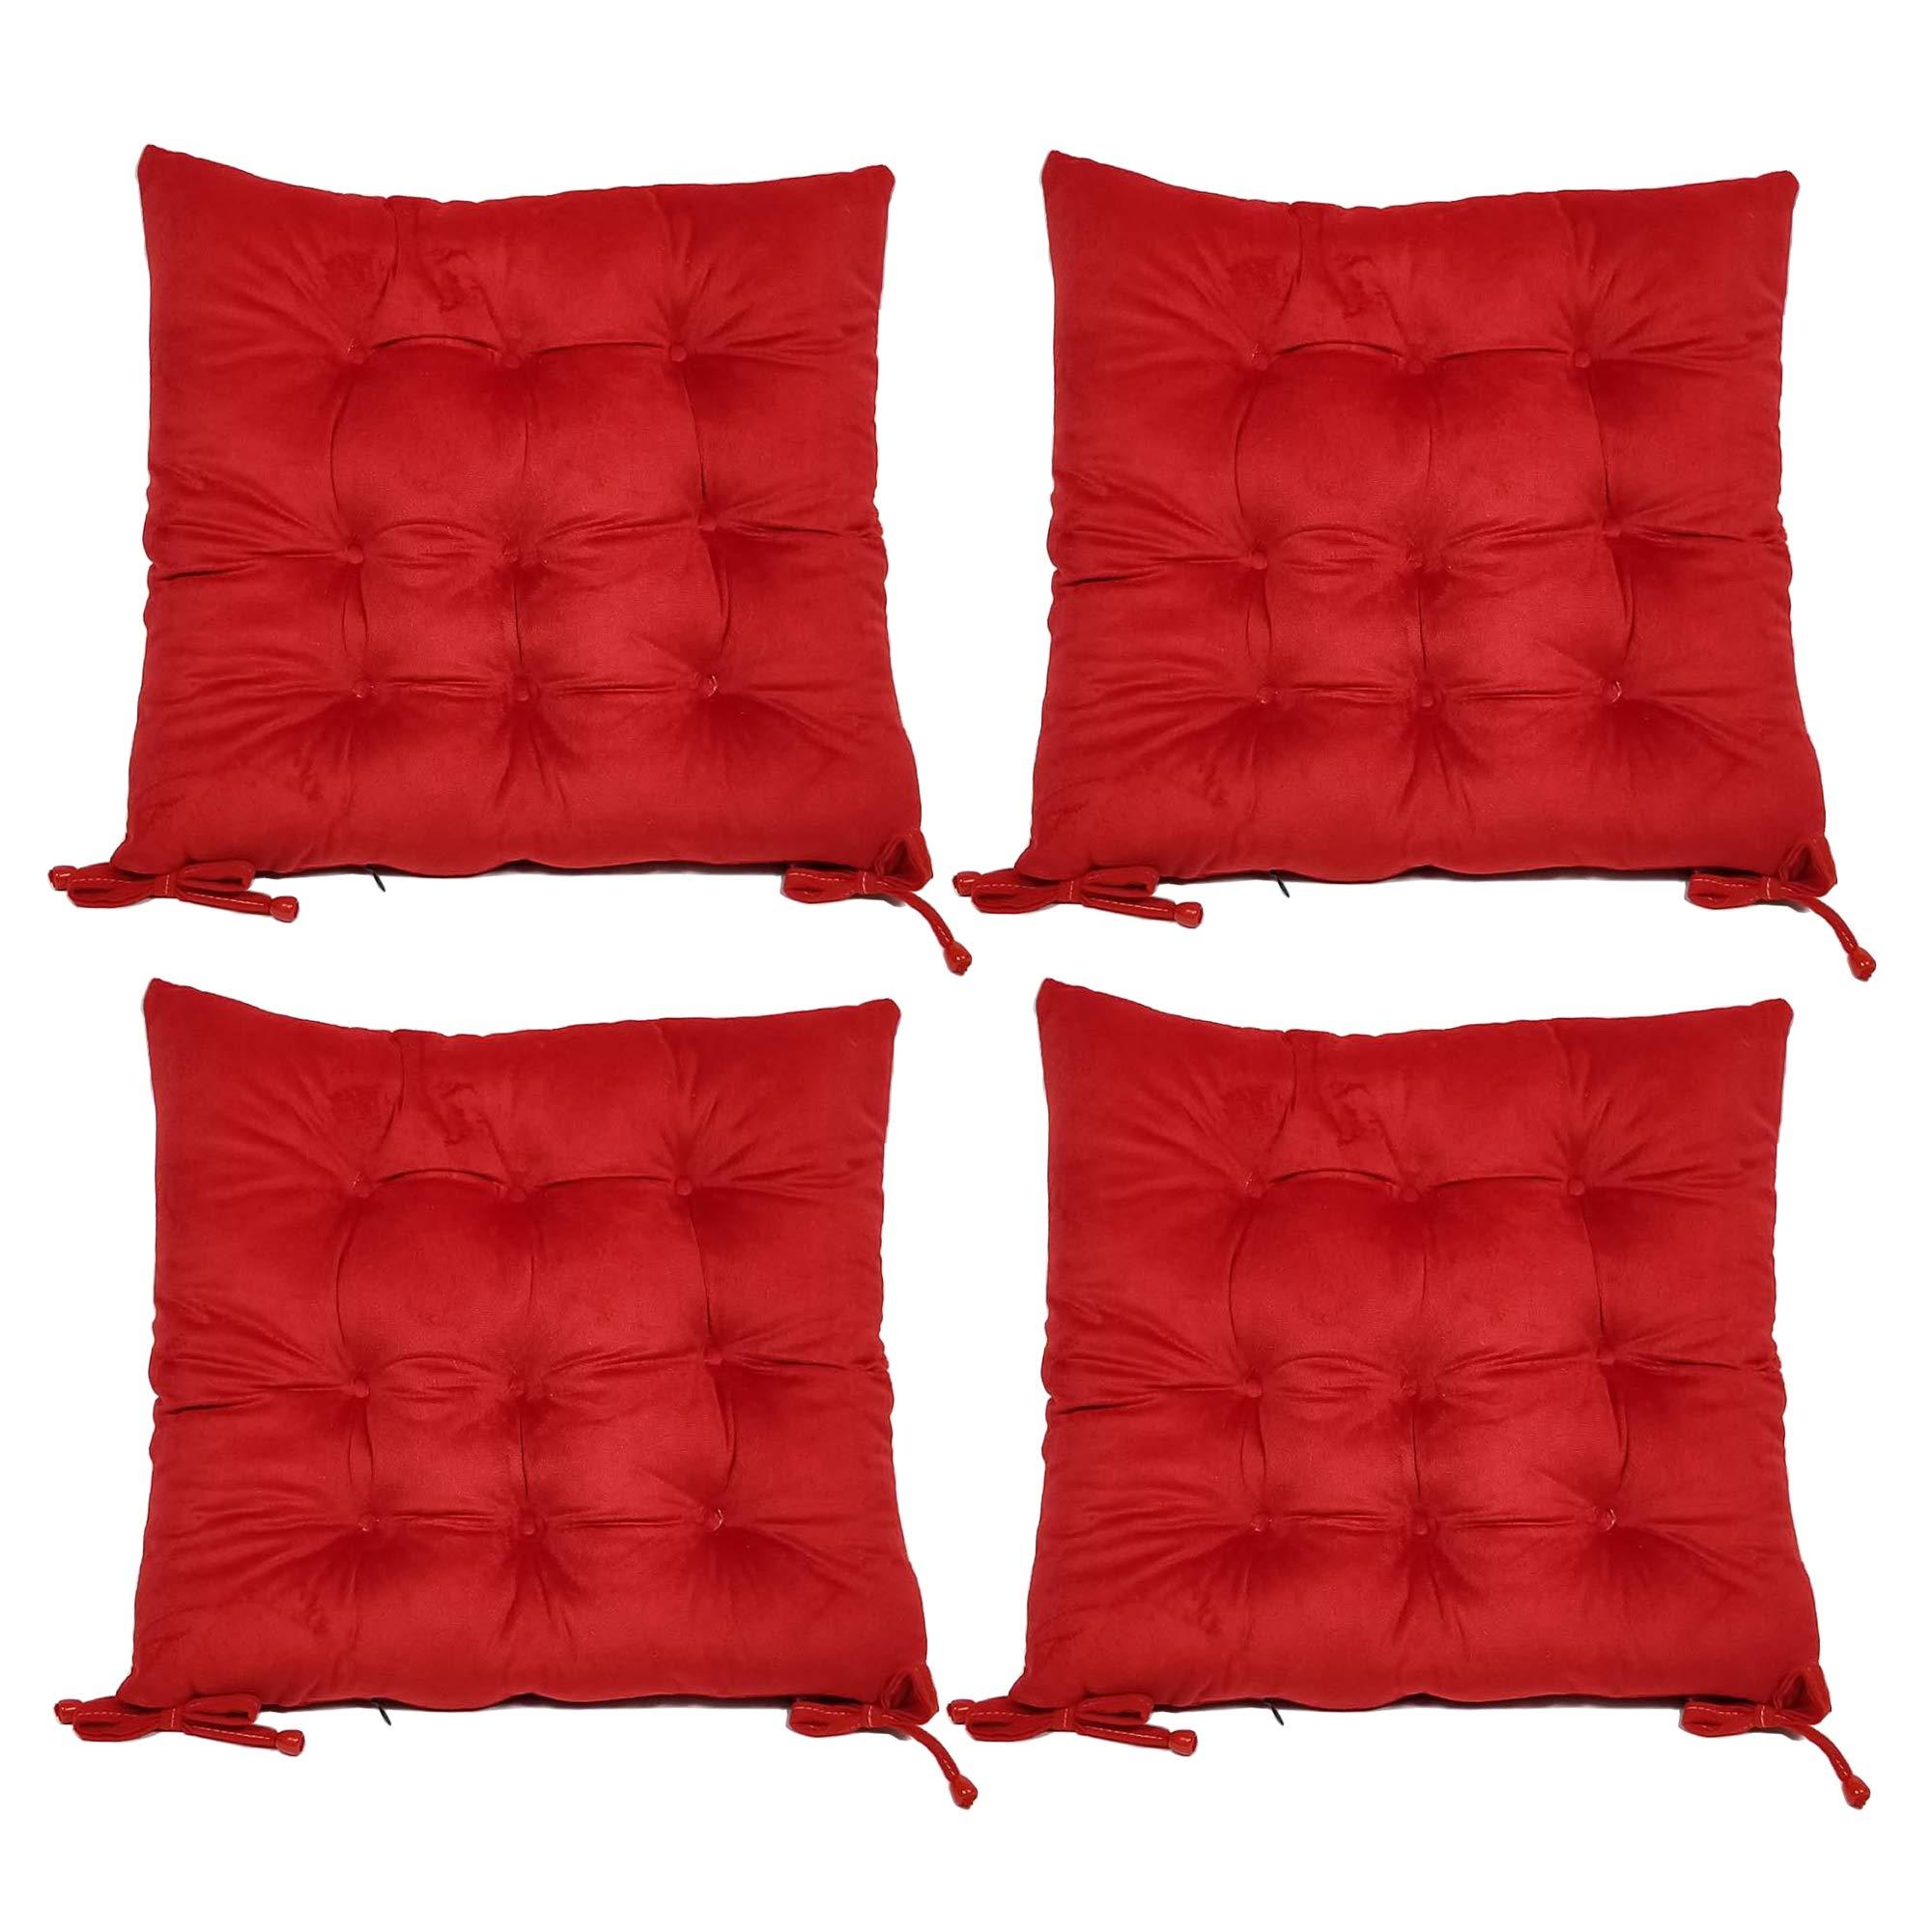 "Hevice Chair Cushion Chair Pad, Chair Pad Kids Seat Cushion Desk Chair, Chair Pad Set of 4 Red, 15""x15""x2""/Piece"